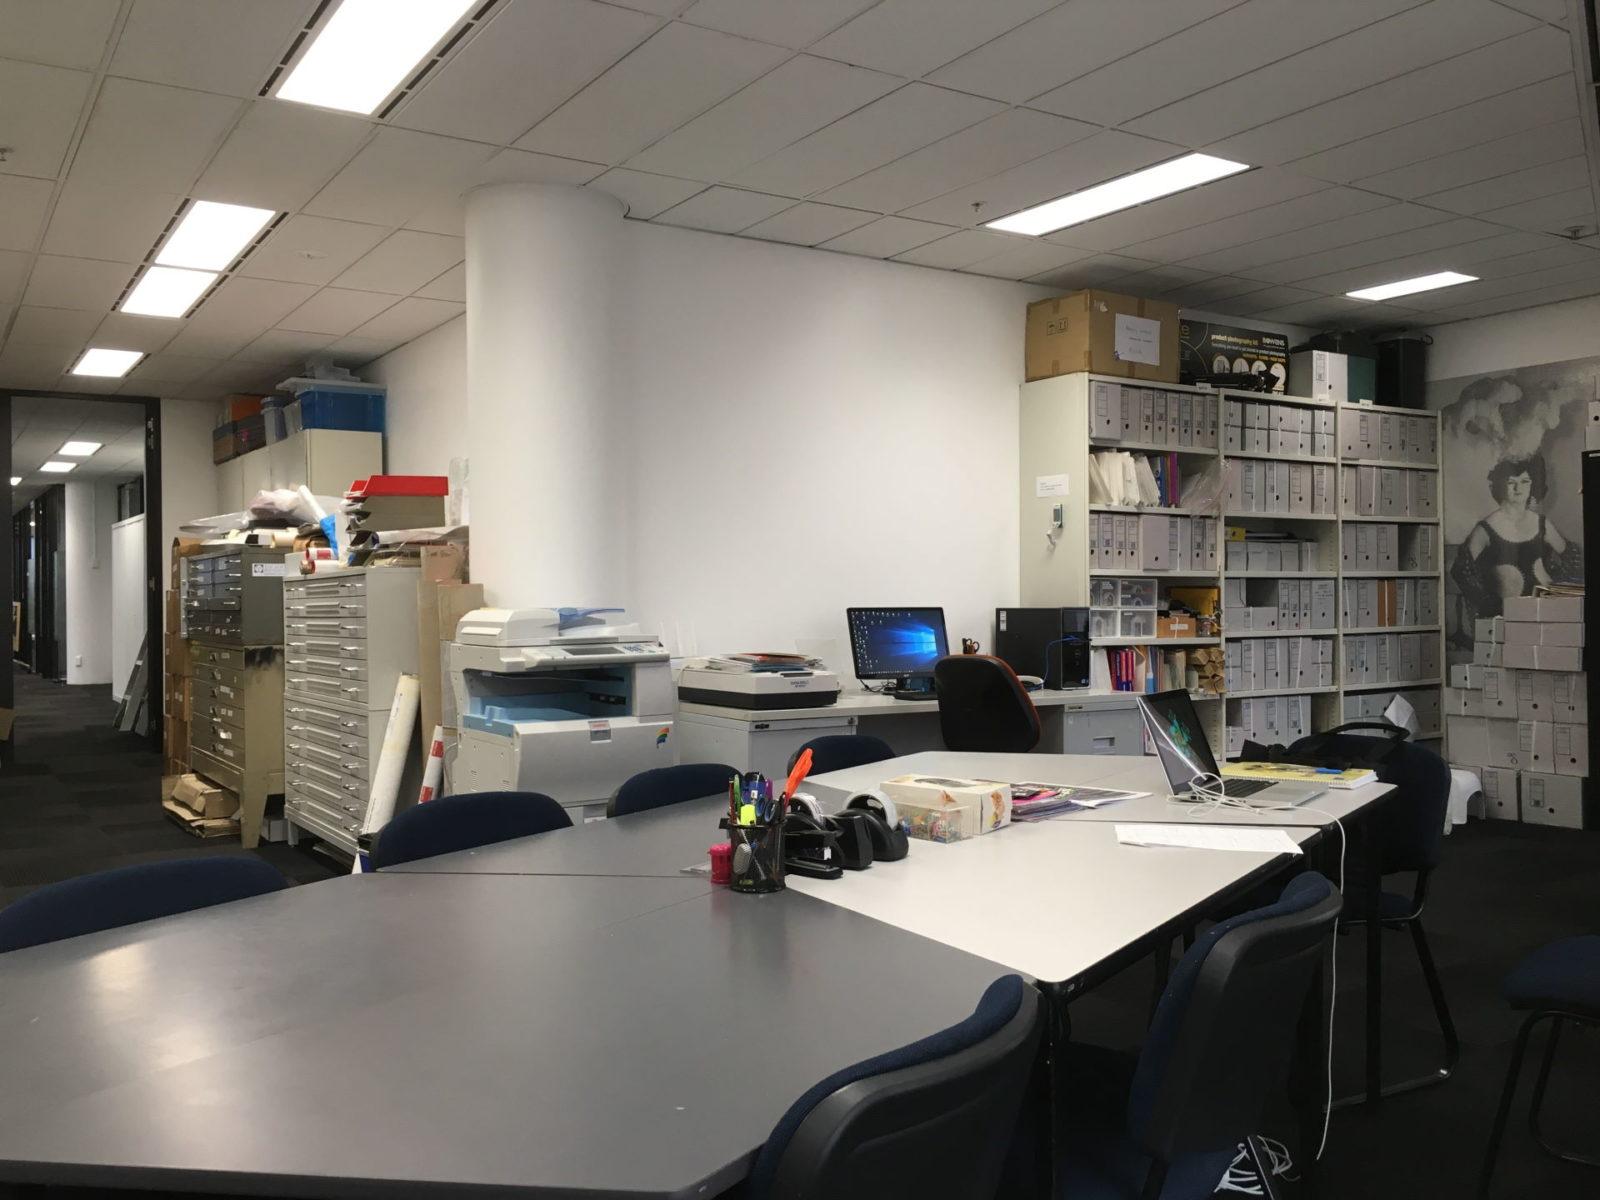 ALGA Reading Room, 615 St Kilda Road Melbourne, 2020 (photo: Kathy Sport)